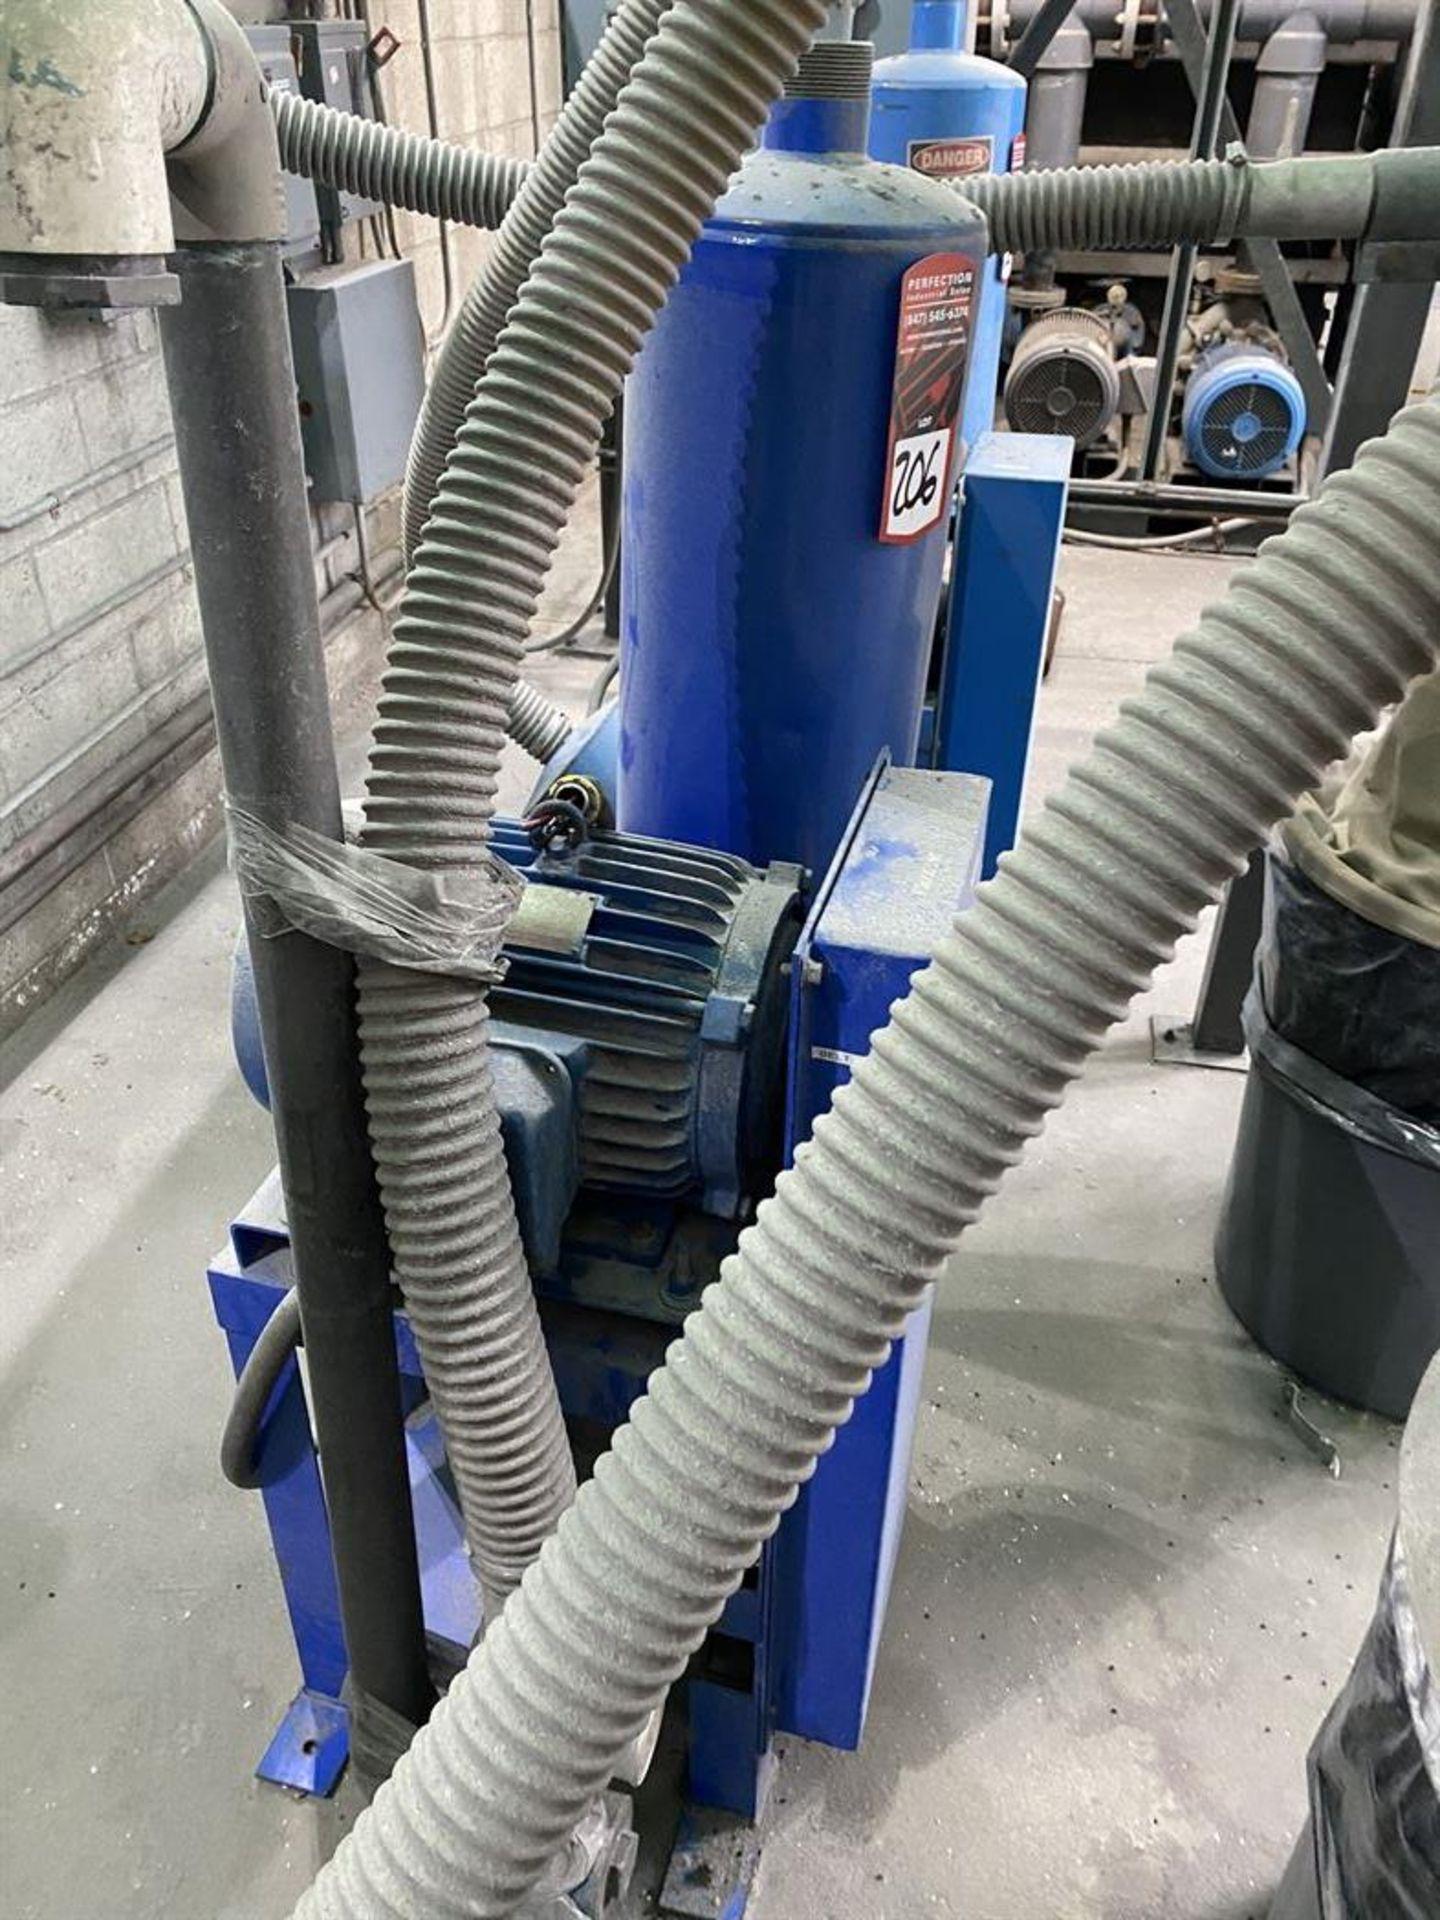 Lot 206 - PNEU CON Pneumatic Conveying System, w/ (2) x 7.5 HP, (1) x 10 HP Blowers